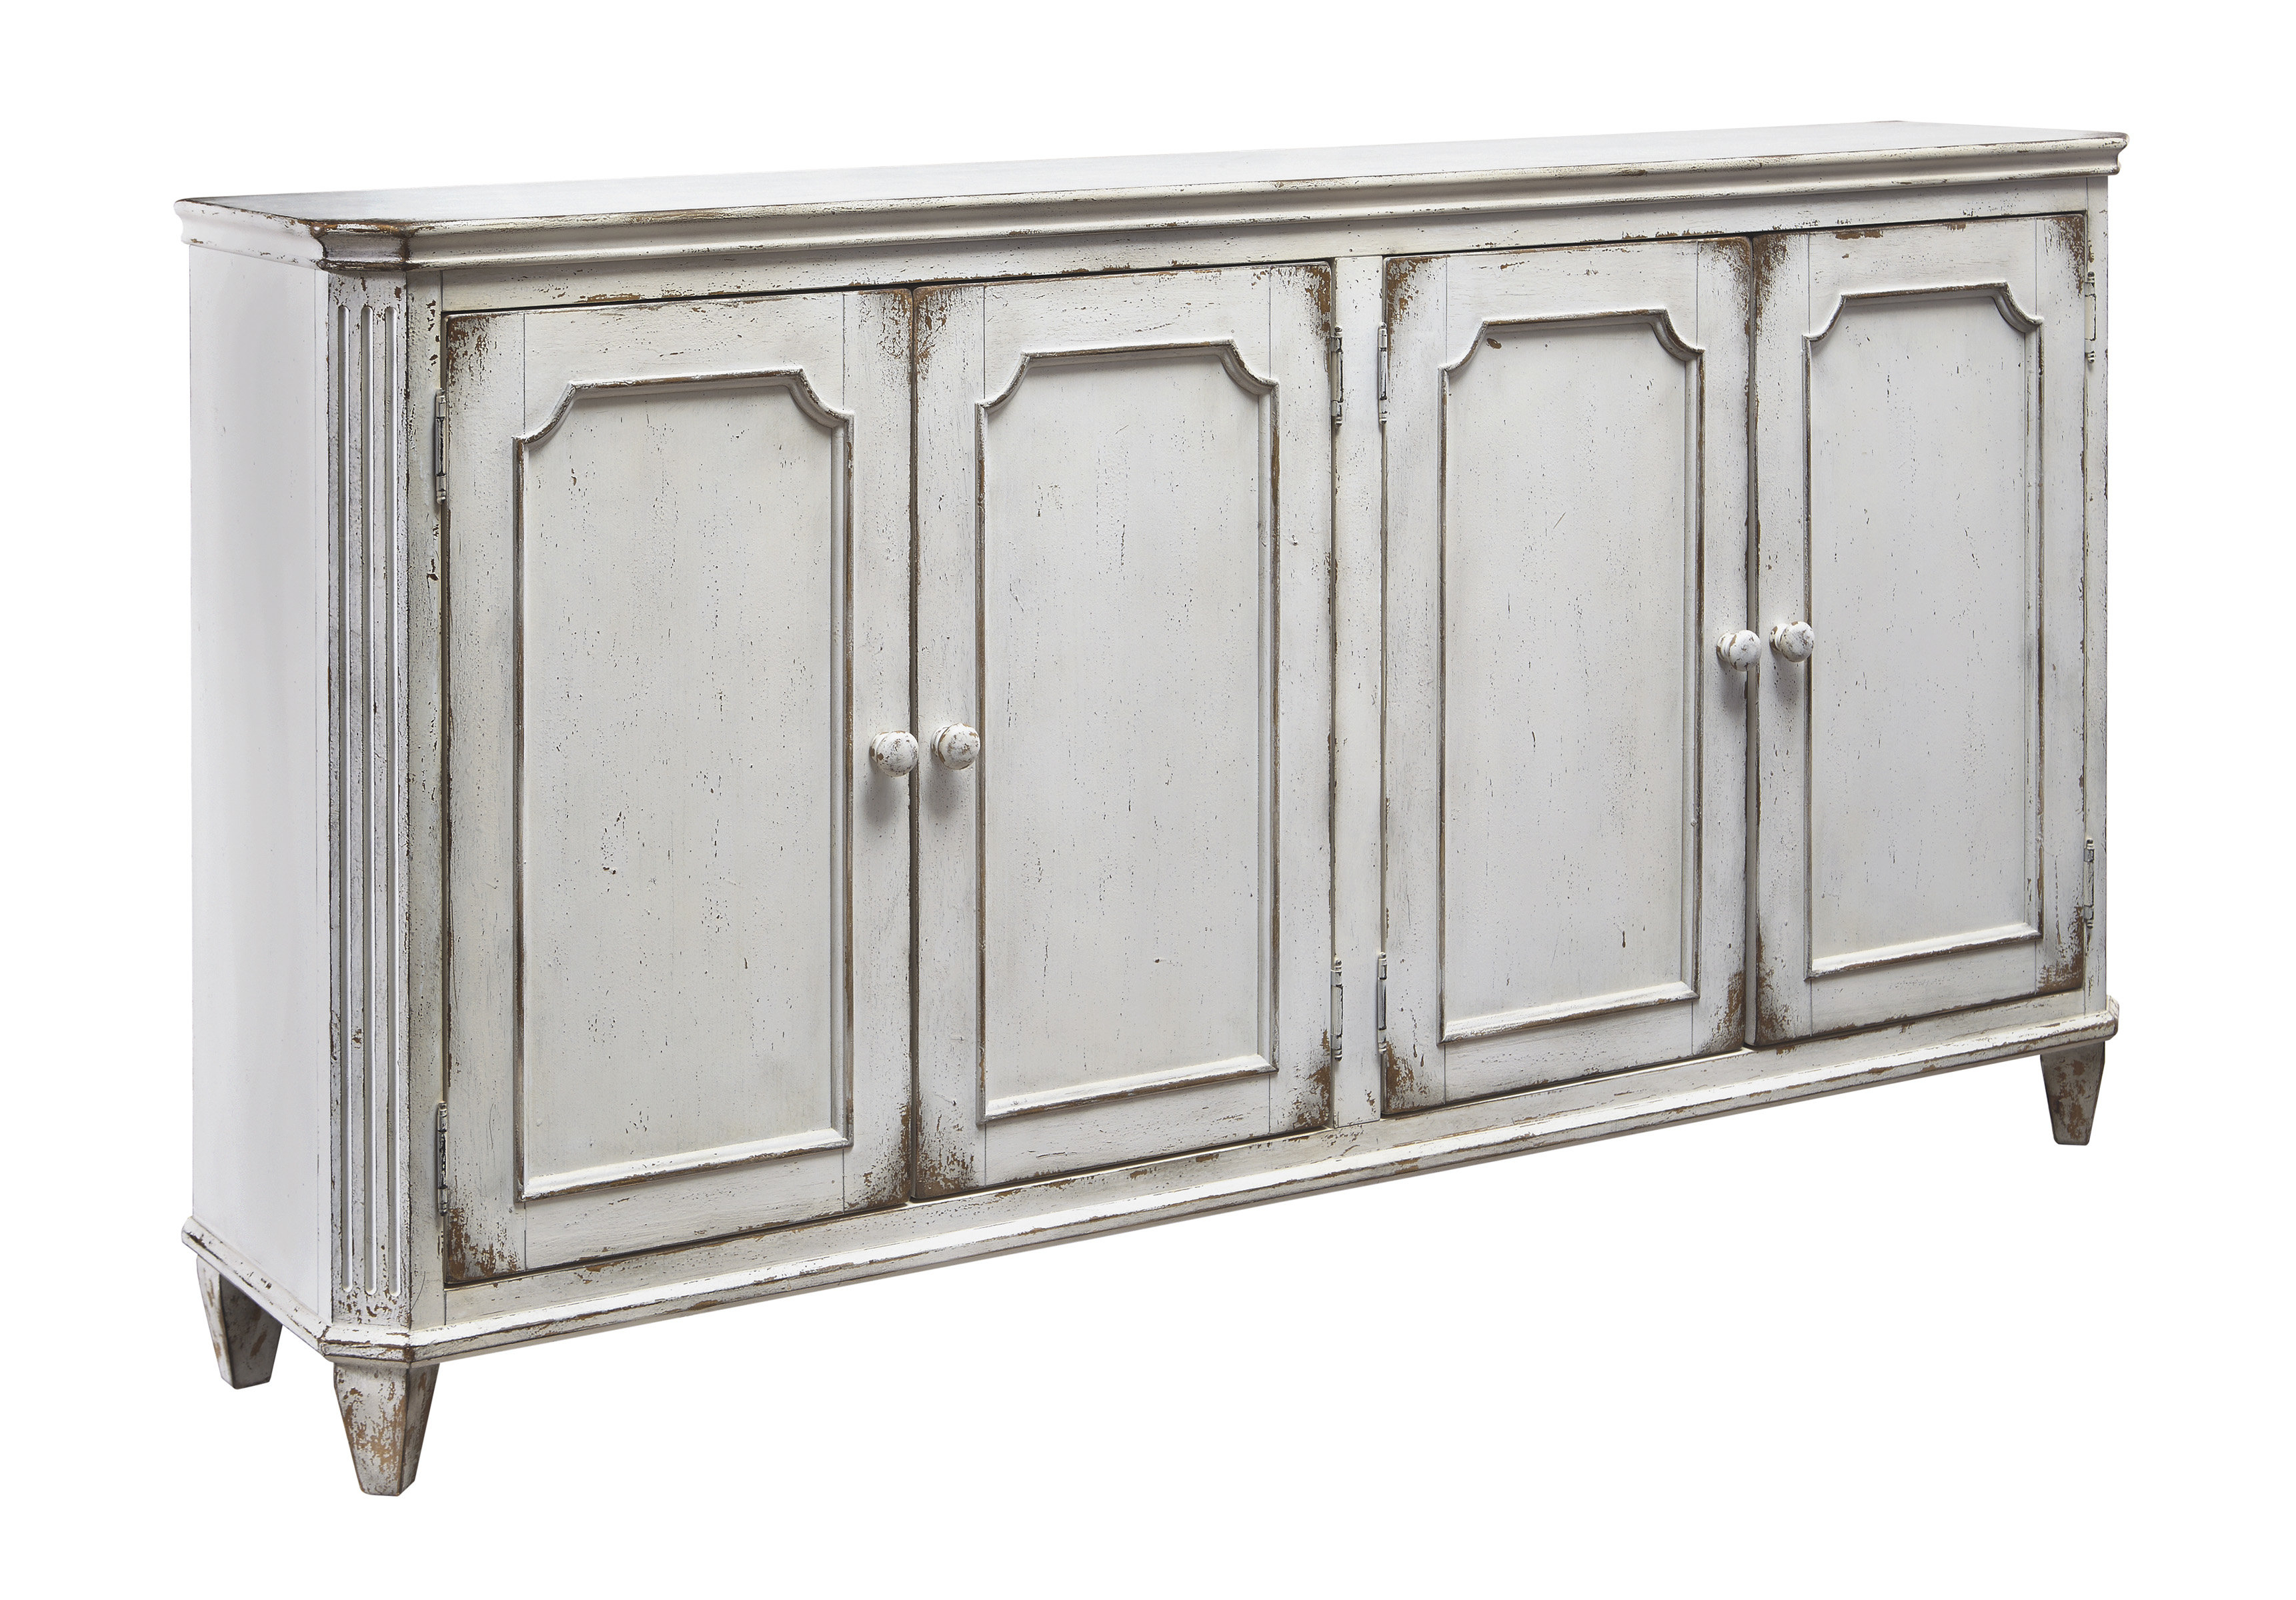 Farmhouse & Rustic White Wood Sideboards & Buffets | Birch Lane regarding Ilyan Traditional Wood Sideboards (Image 9 of 30)